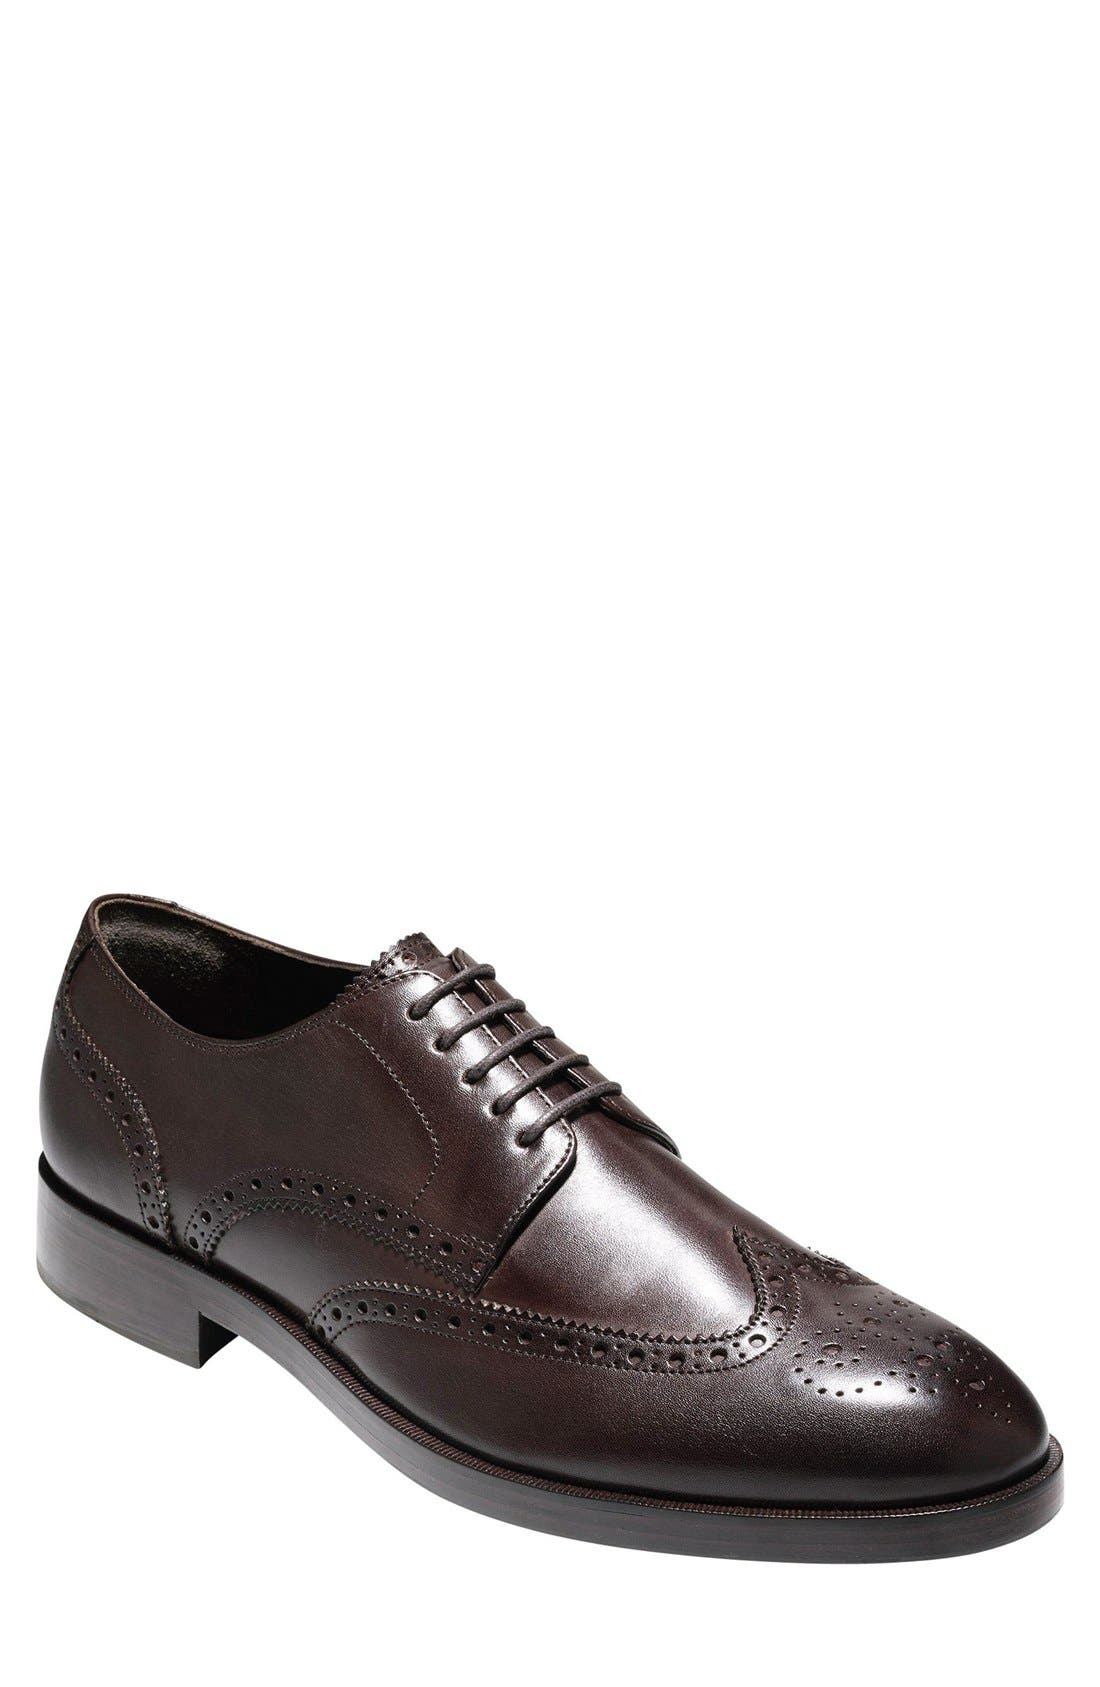 'Harrison Grand' Wingtip,                             Main thumbnail 1, color,                             Dark Brown Leather